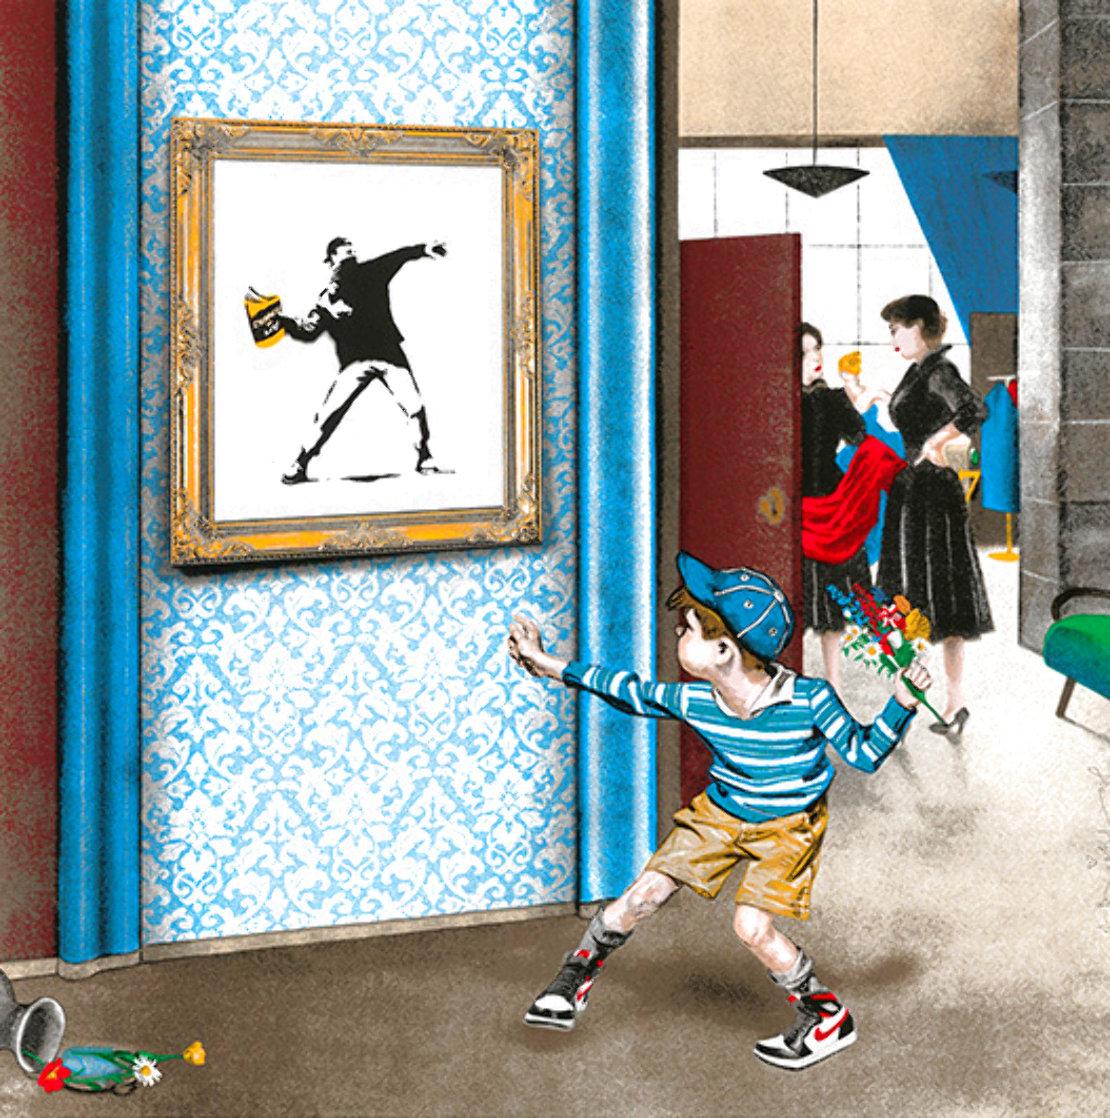 Life Imitates Art 2020 Limited Edition Print by Mr. Brainwash